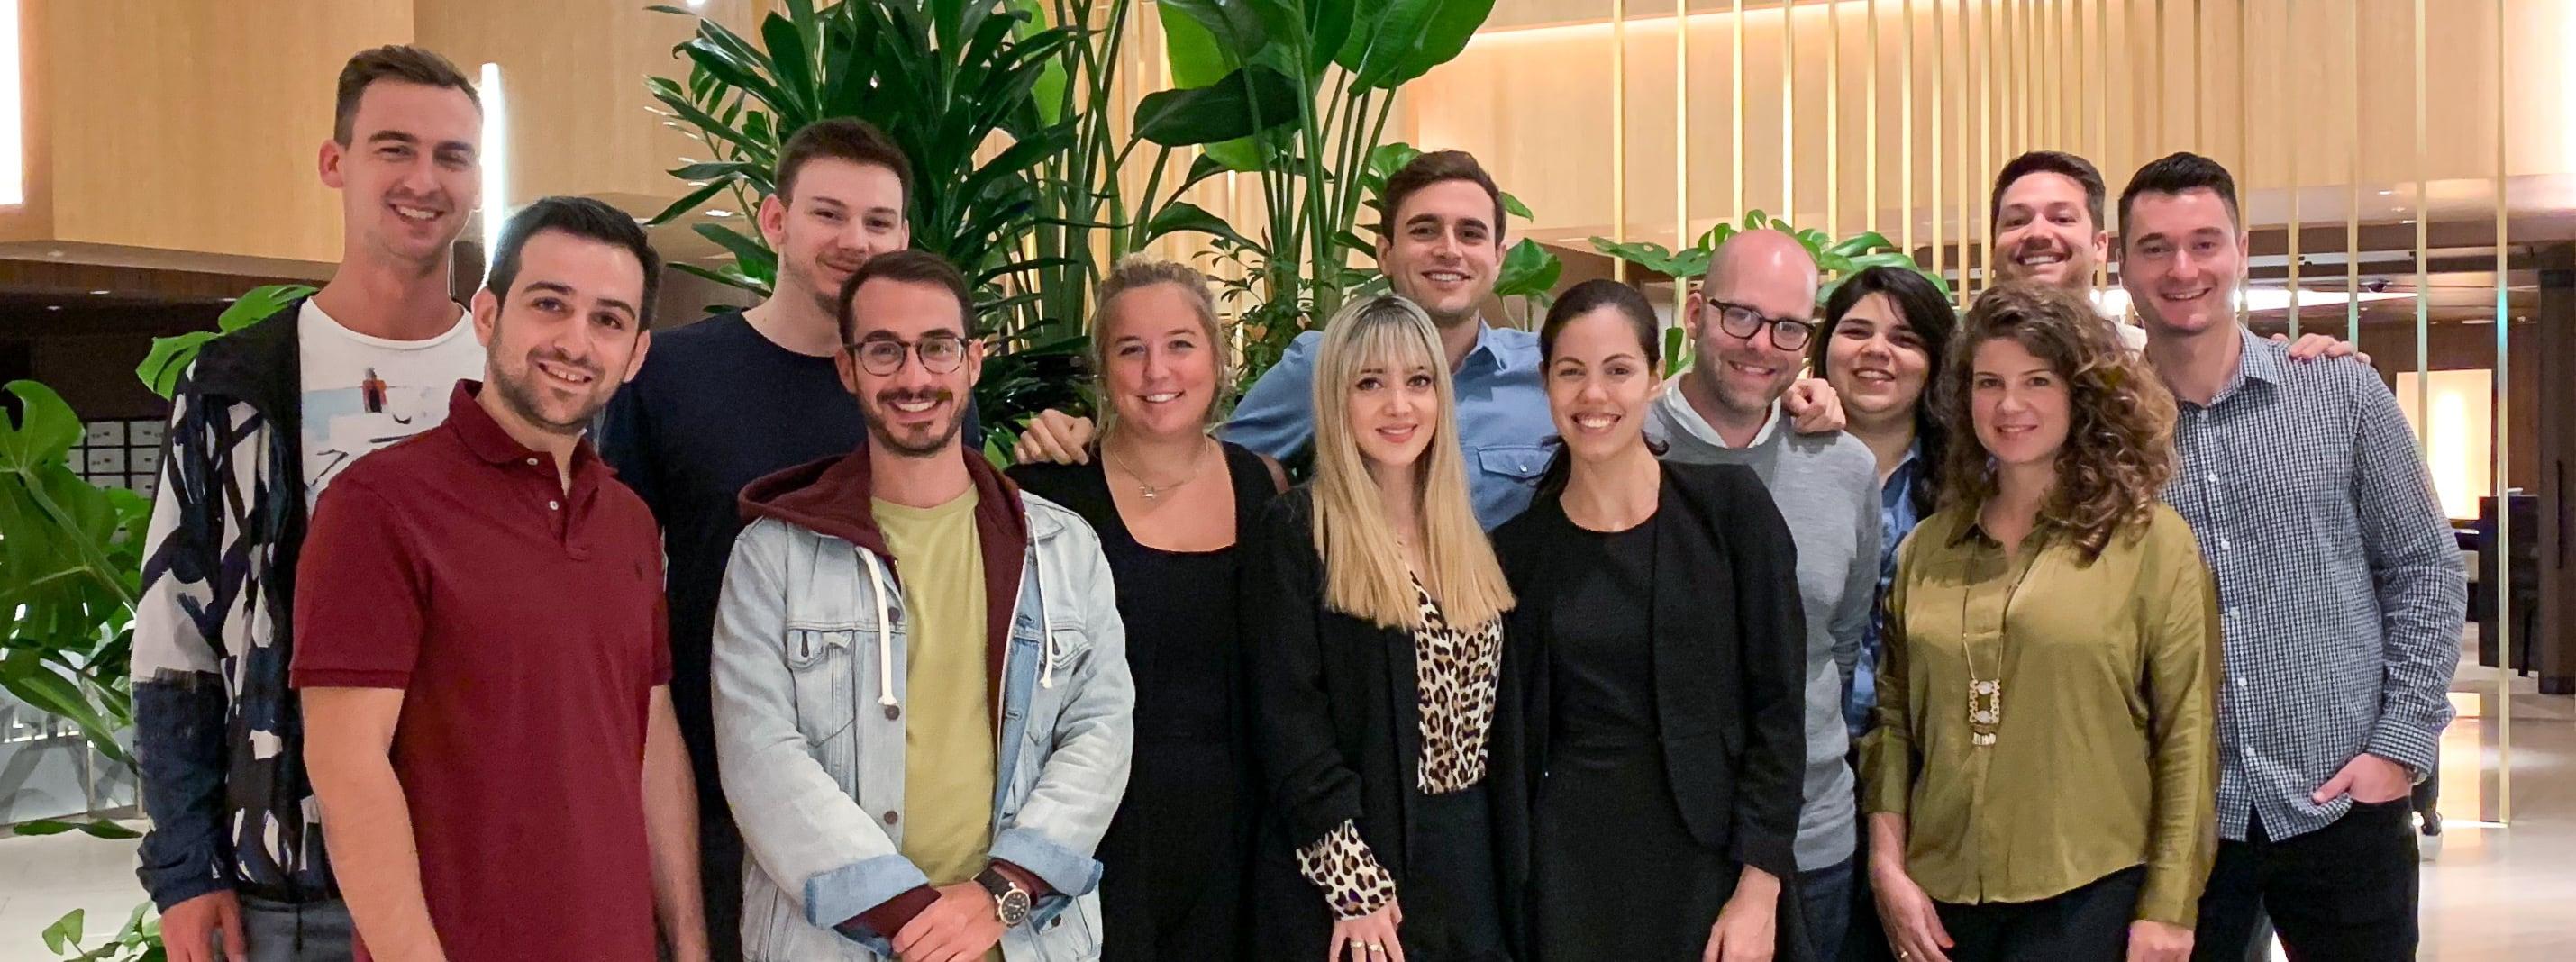 Gadget Flow team